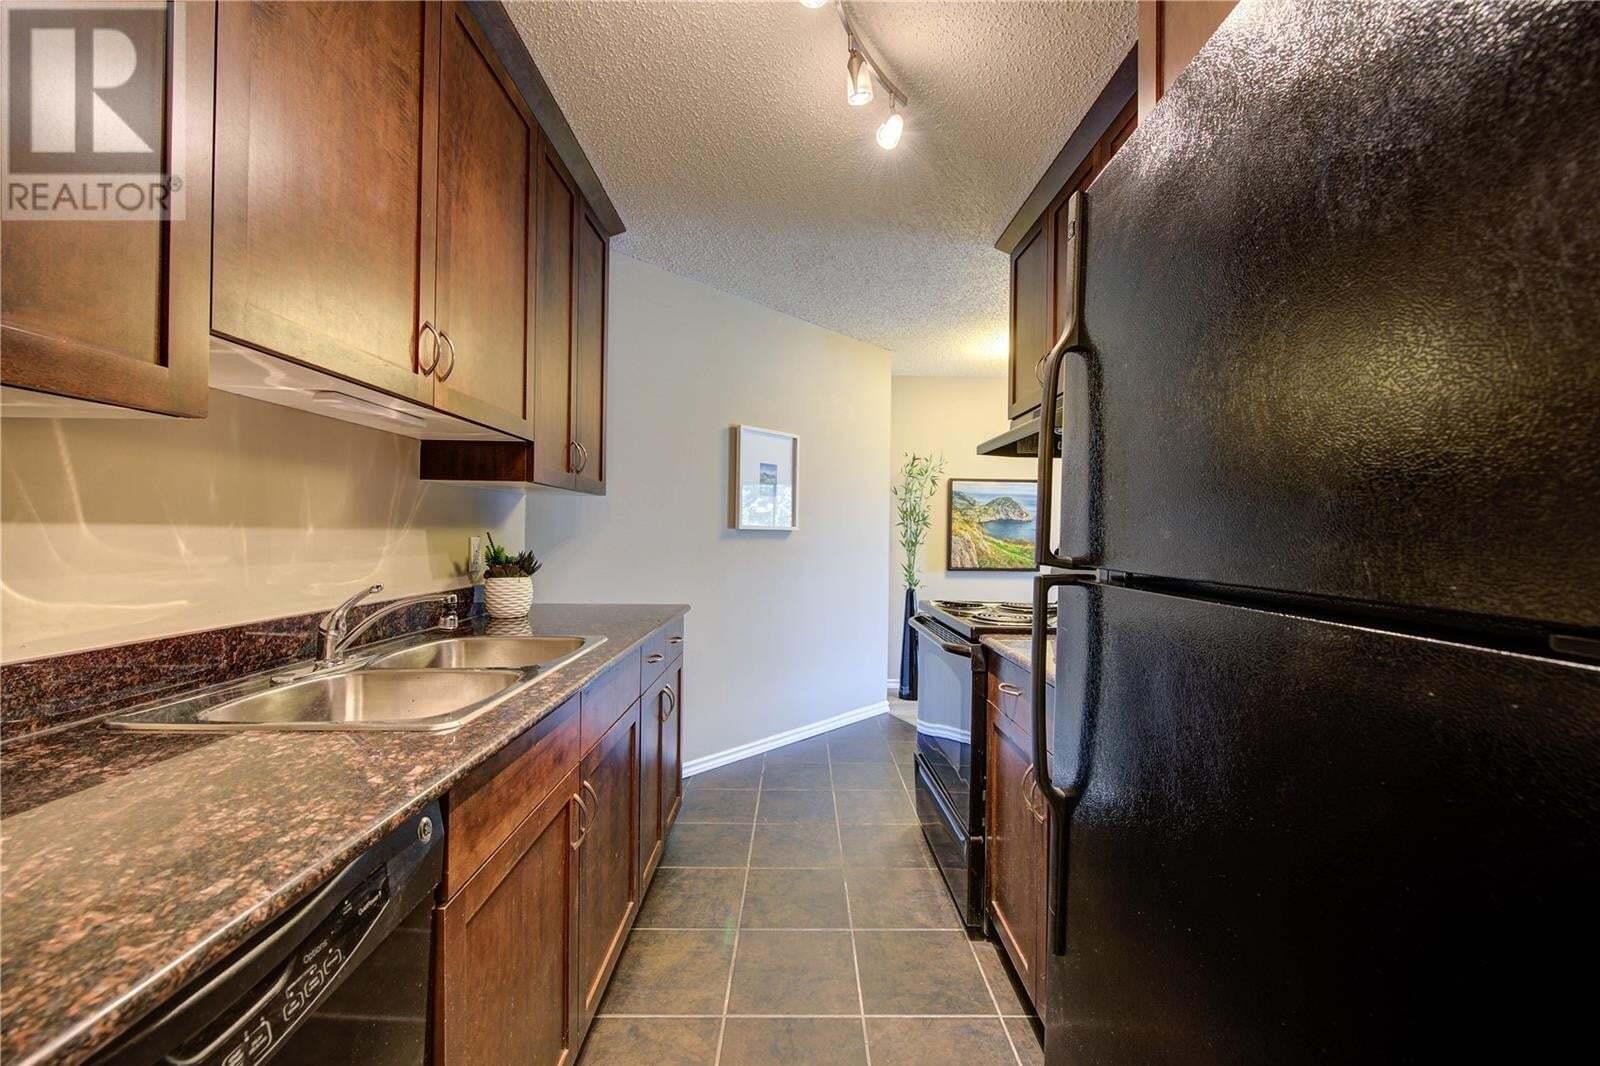 Condo for sale at 2233 St Henry Ave Unit 215 Saskatoon Saskatchewan - MLS: SK821150